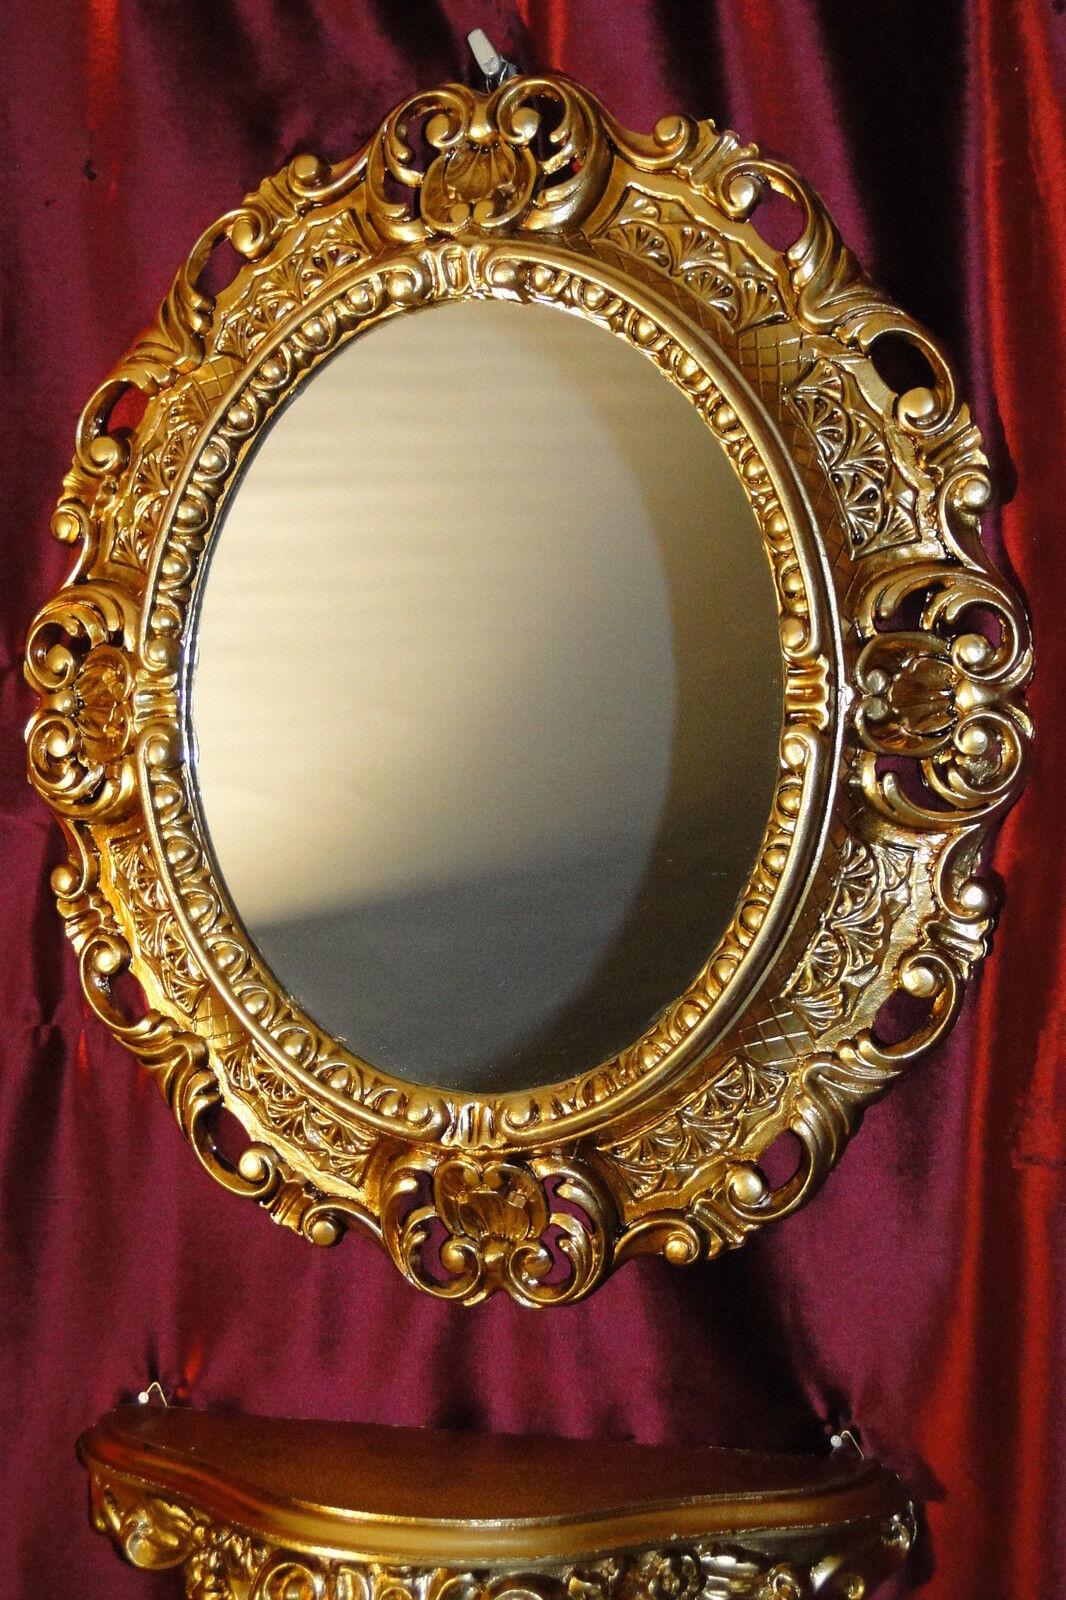 wandspiegel konsole oval wandkonsole set barock antik gold 44x38 badspiegel 1. Black Bedroom Furniture Sets. Home Design Ideas